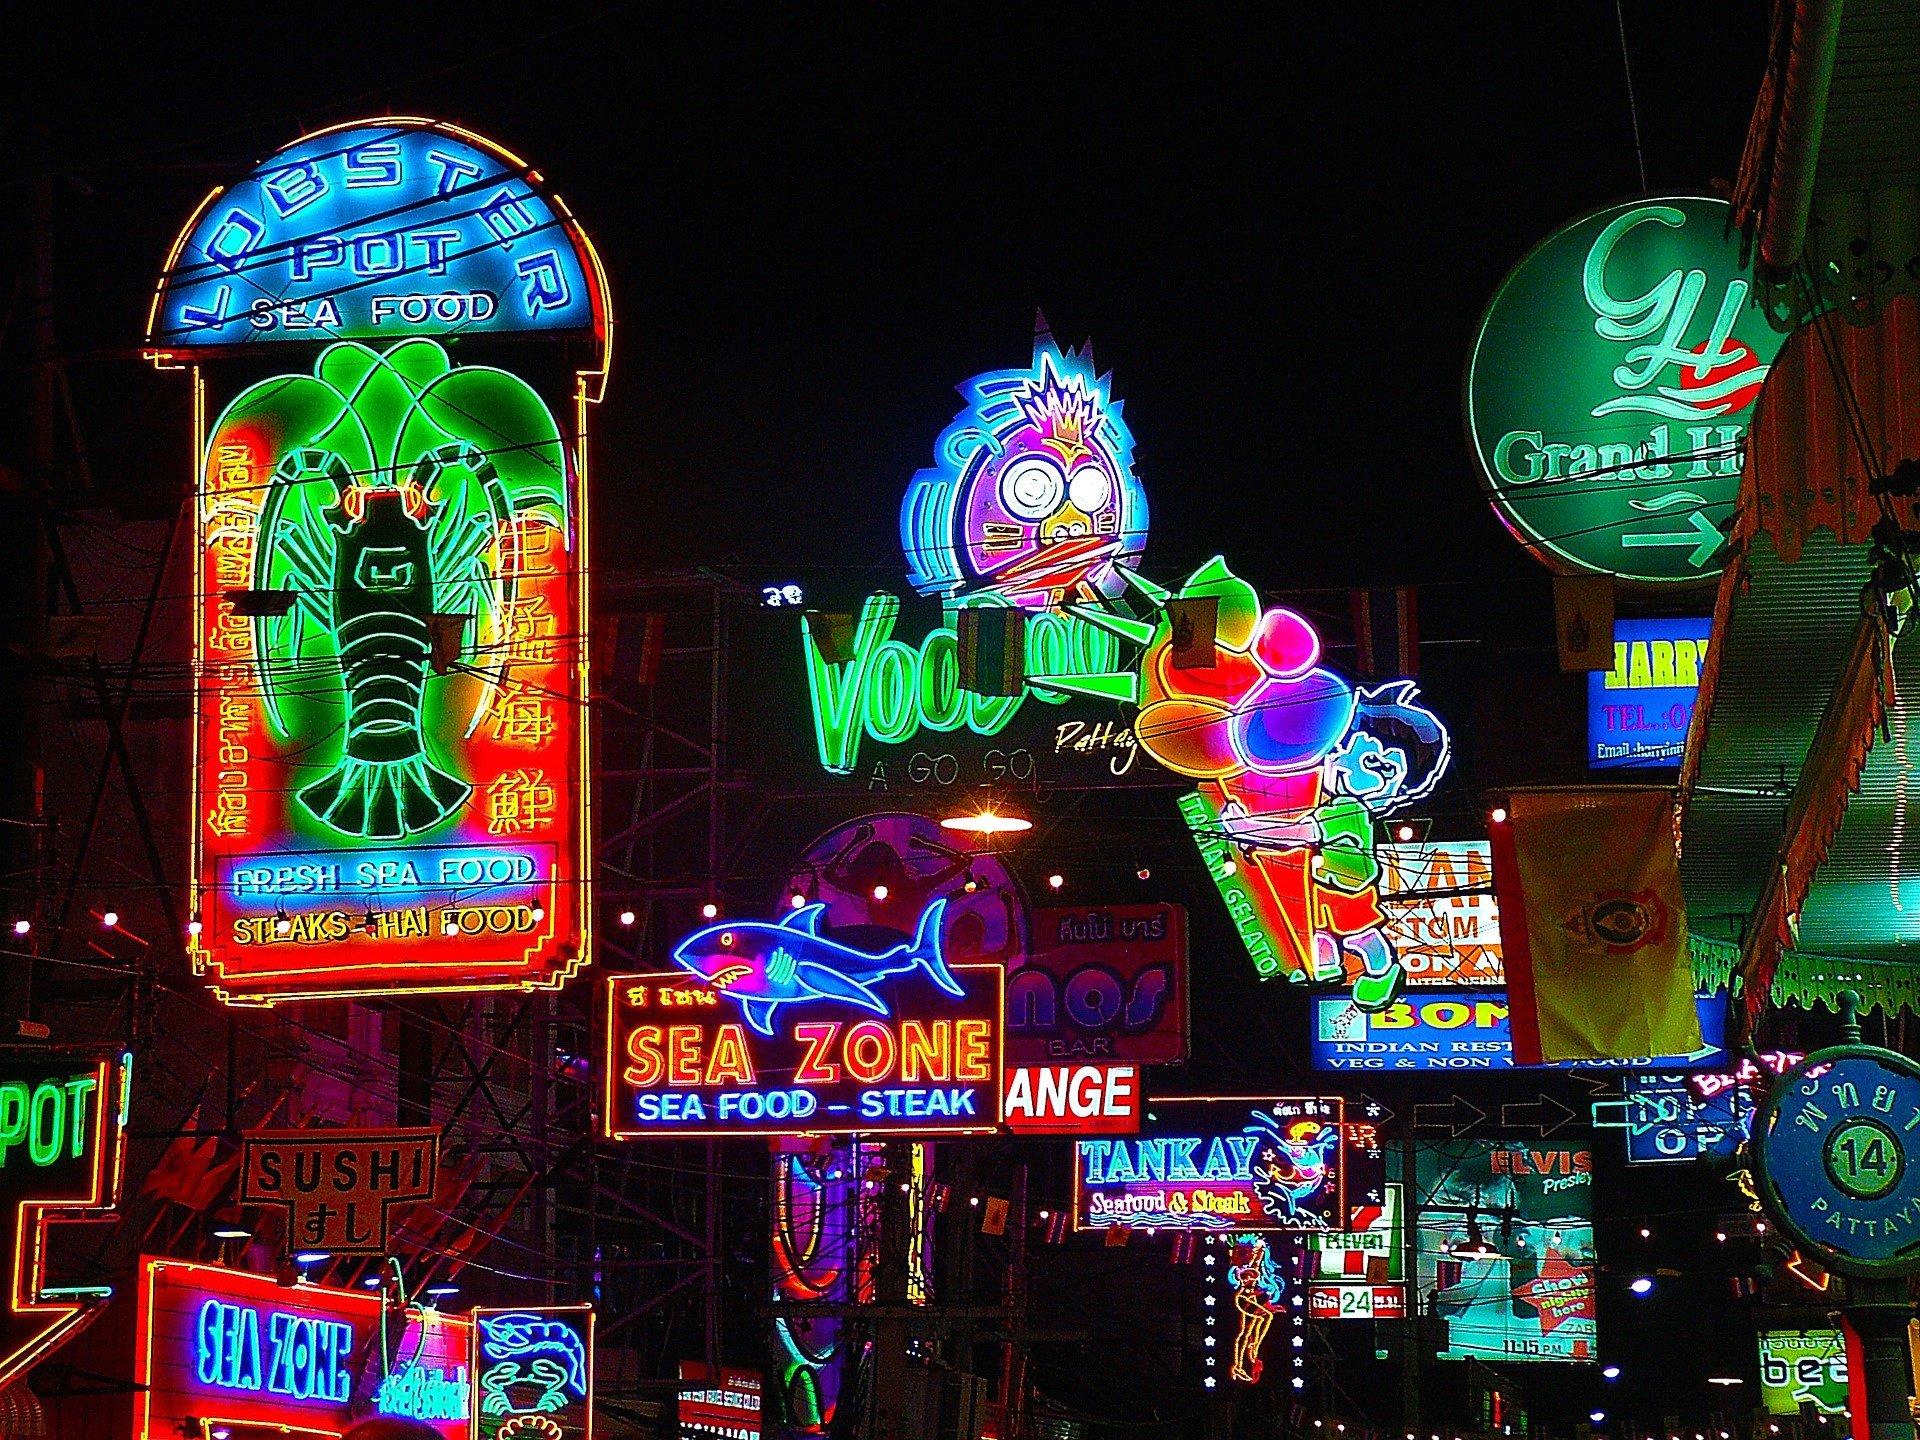 Neon signs in Pattaya City